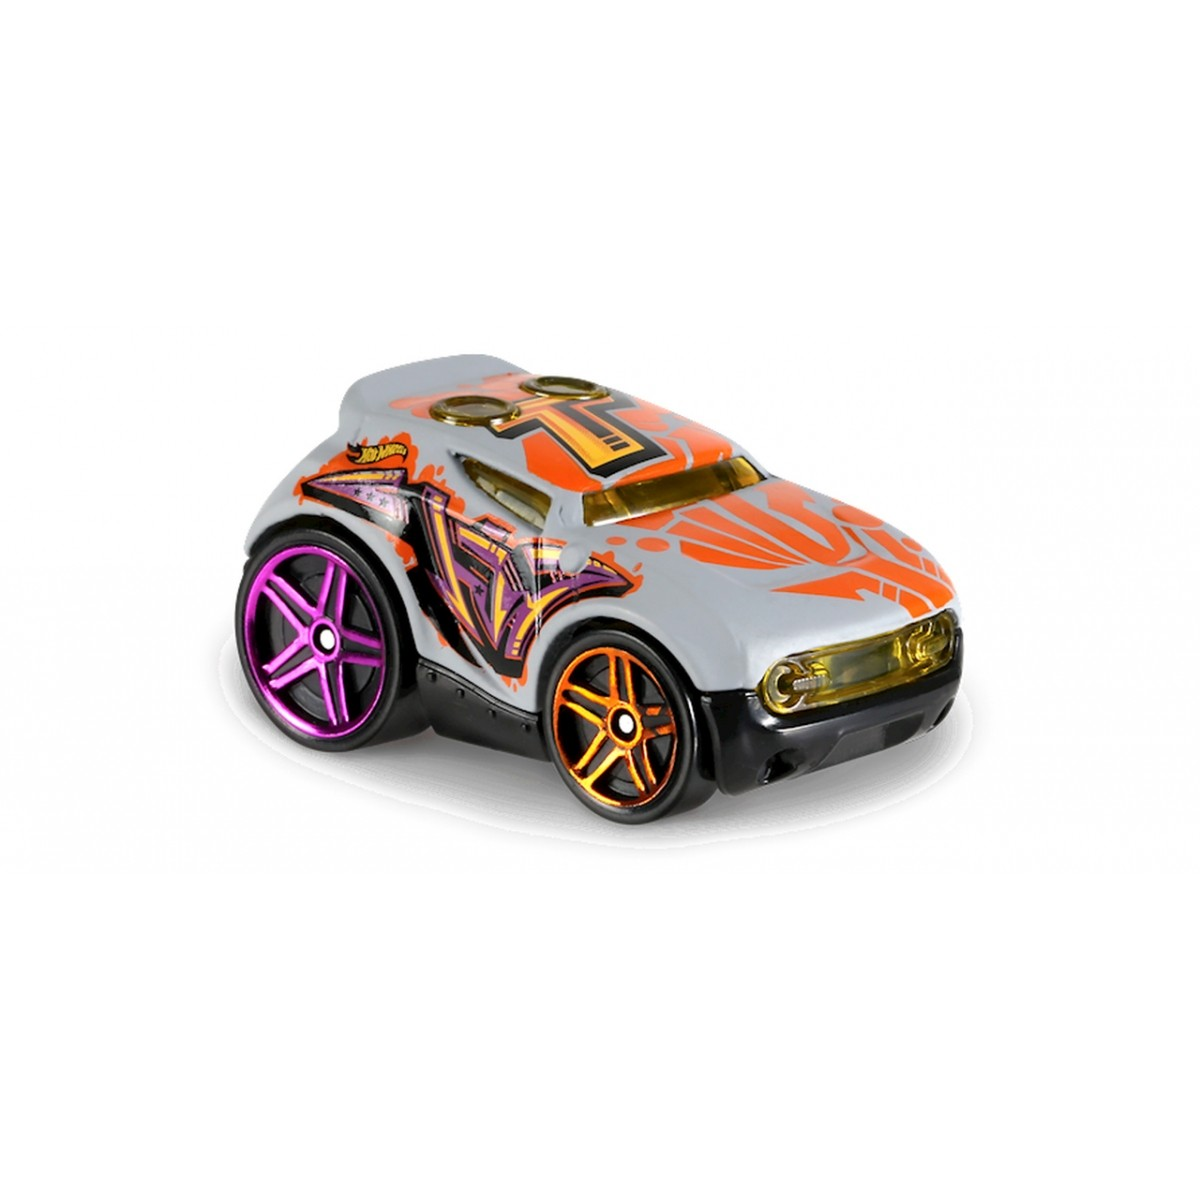 Carrinho Hot Wheels: Rocket Box Cinza